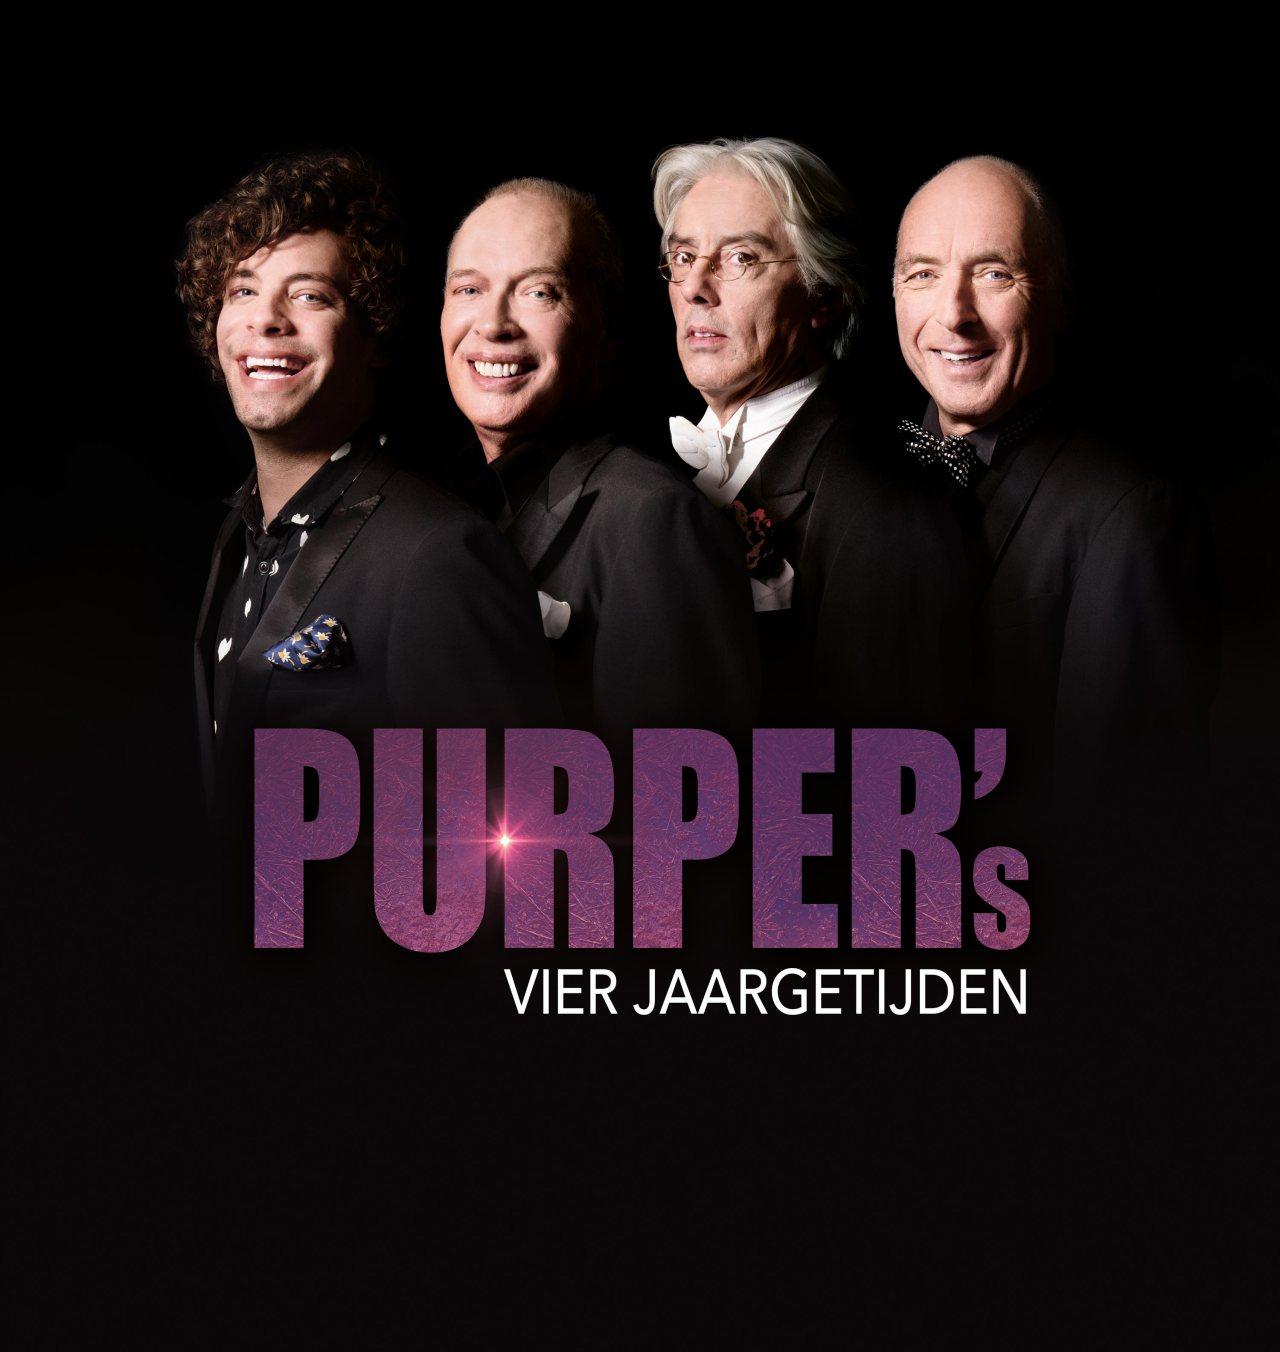 PURPER terug in het theater met Frans Mulder, Erik Brey, Alfred van den Heuvel en Diederick Ensink